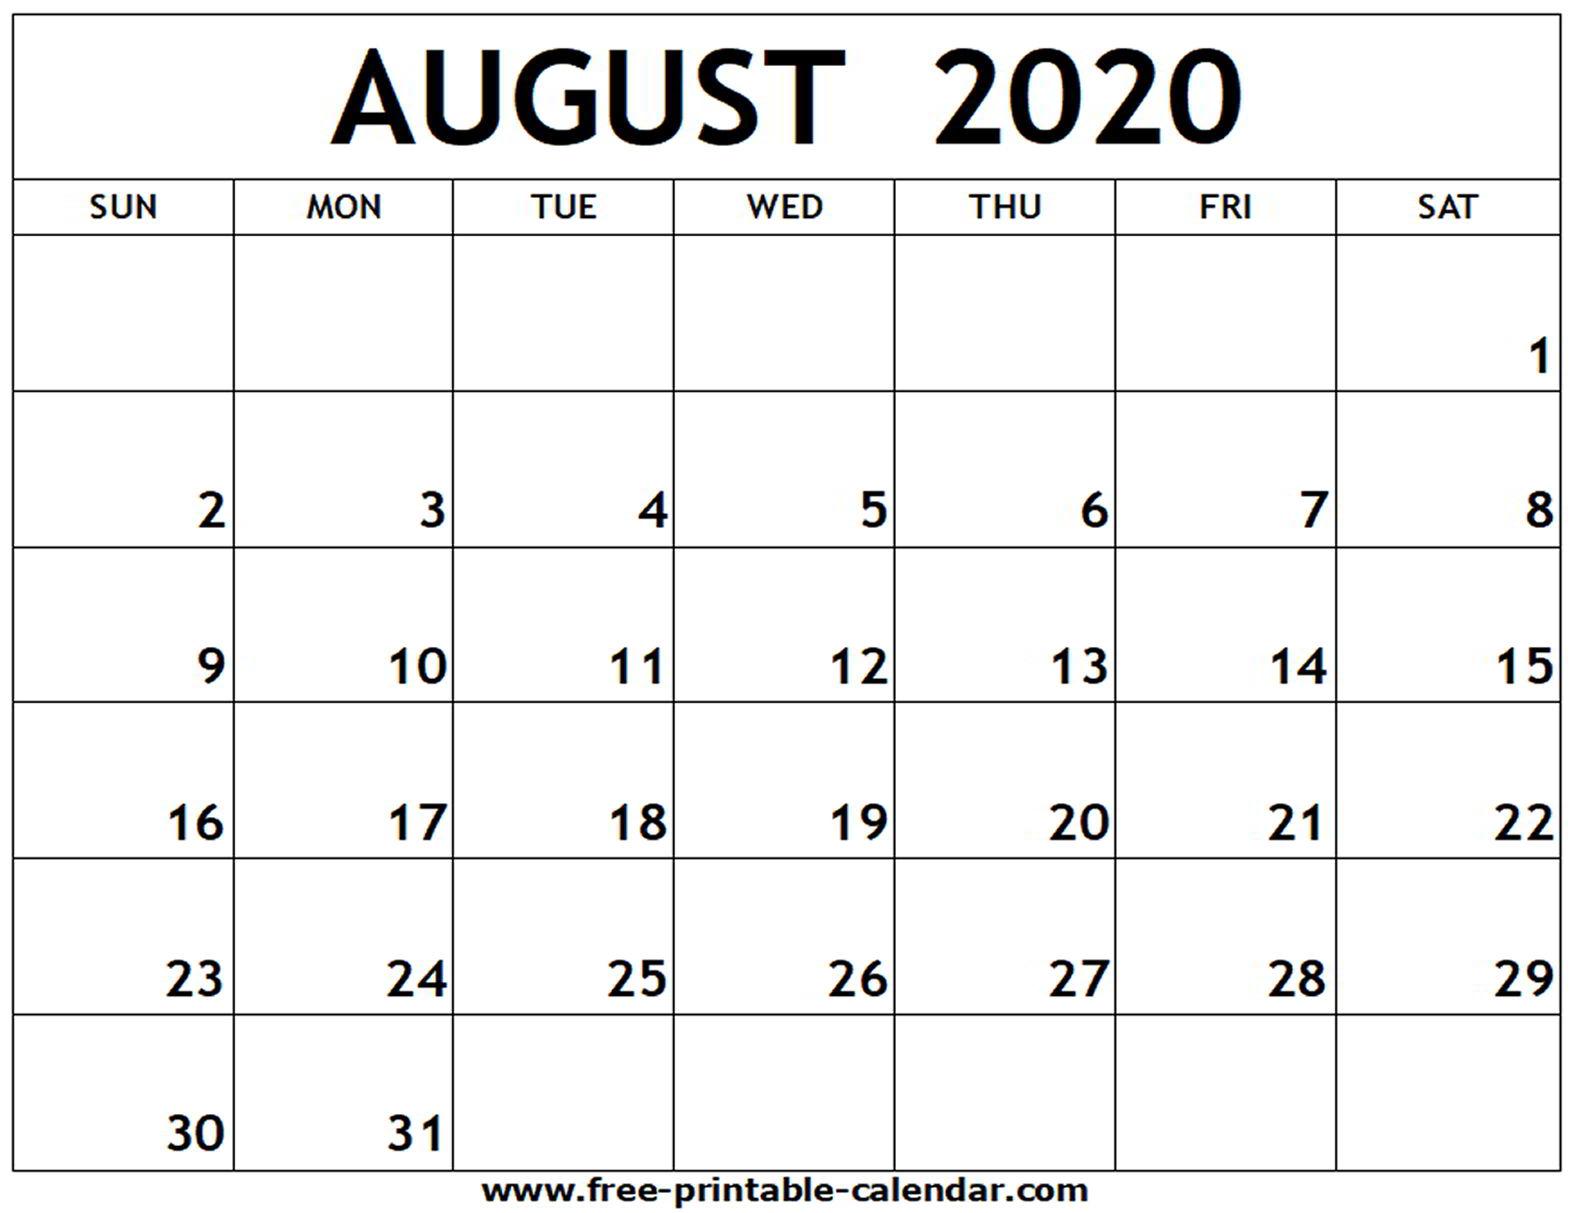 August 2020 Printable Calendar - Free-Printable-Calendar throughout Fill In Calendar Printable 2020